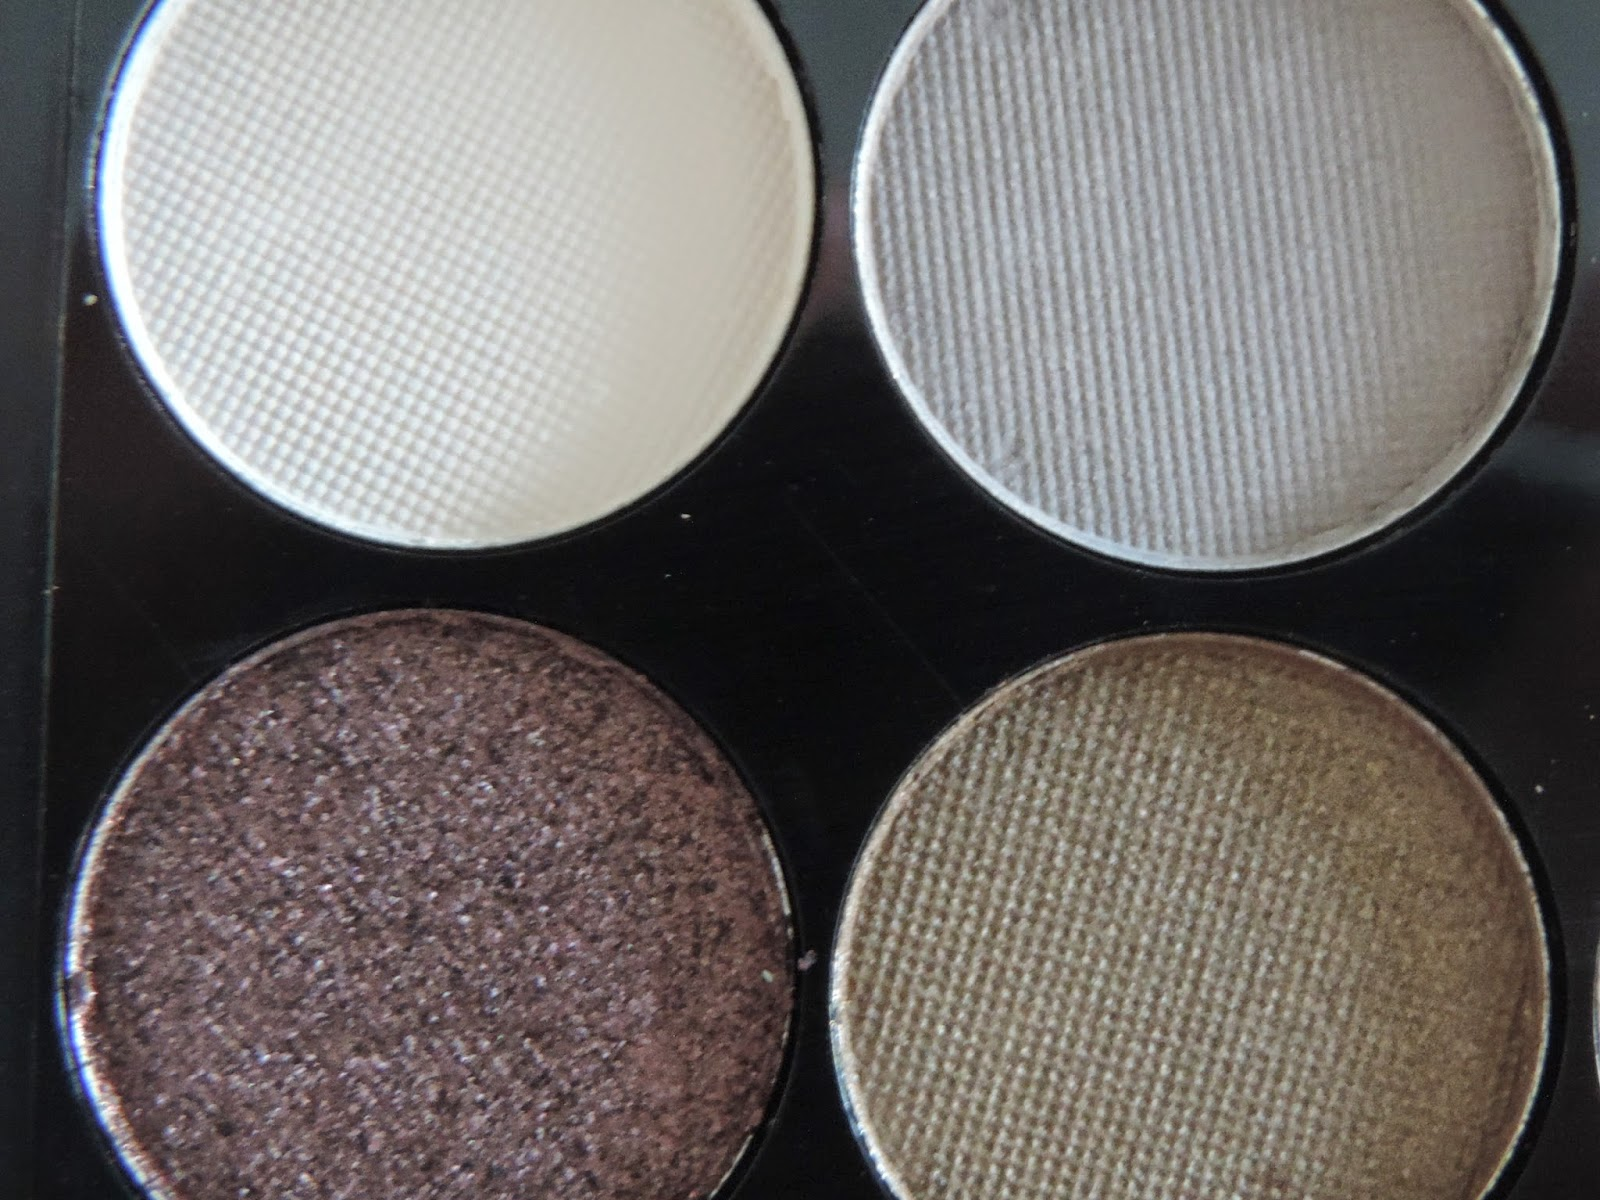 Close up of Sleek MakeUp iDivine Au Naturel Palette